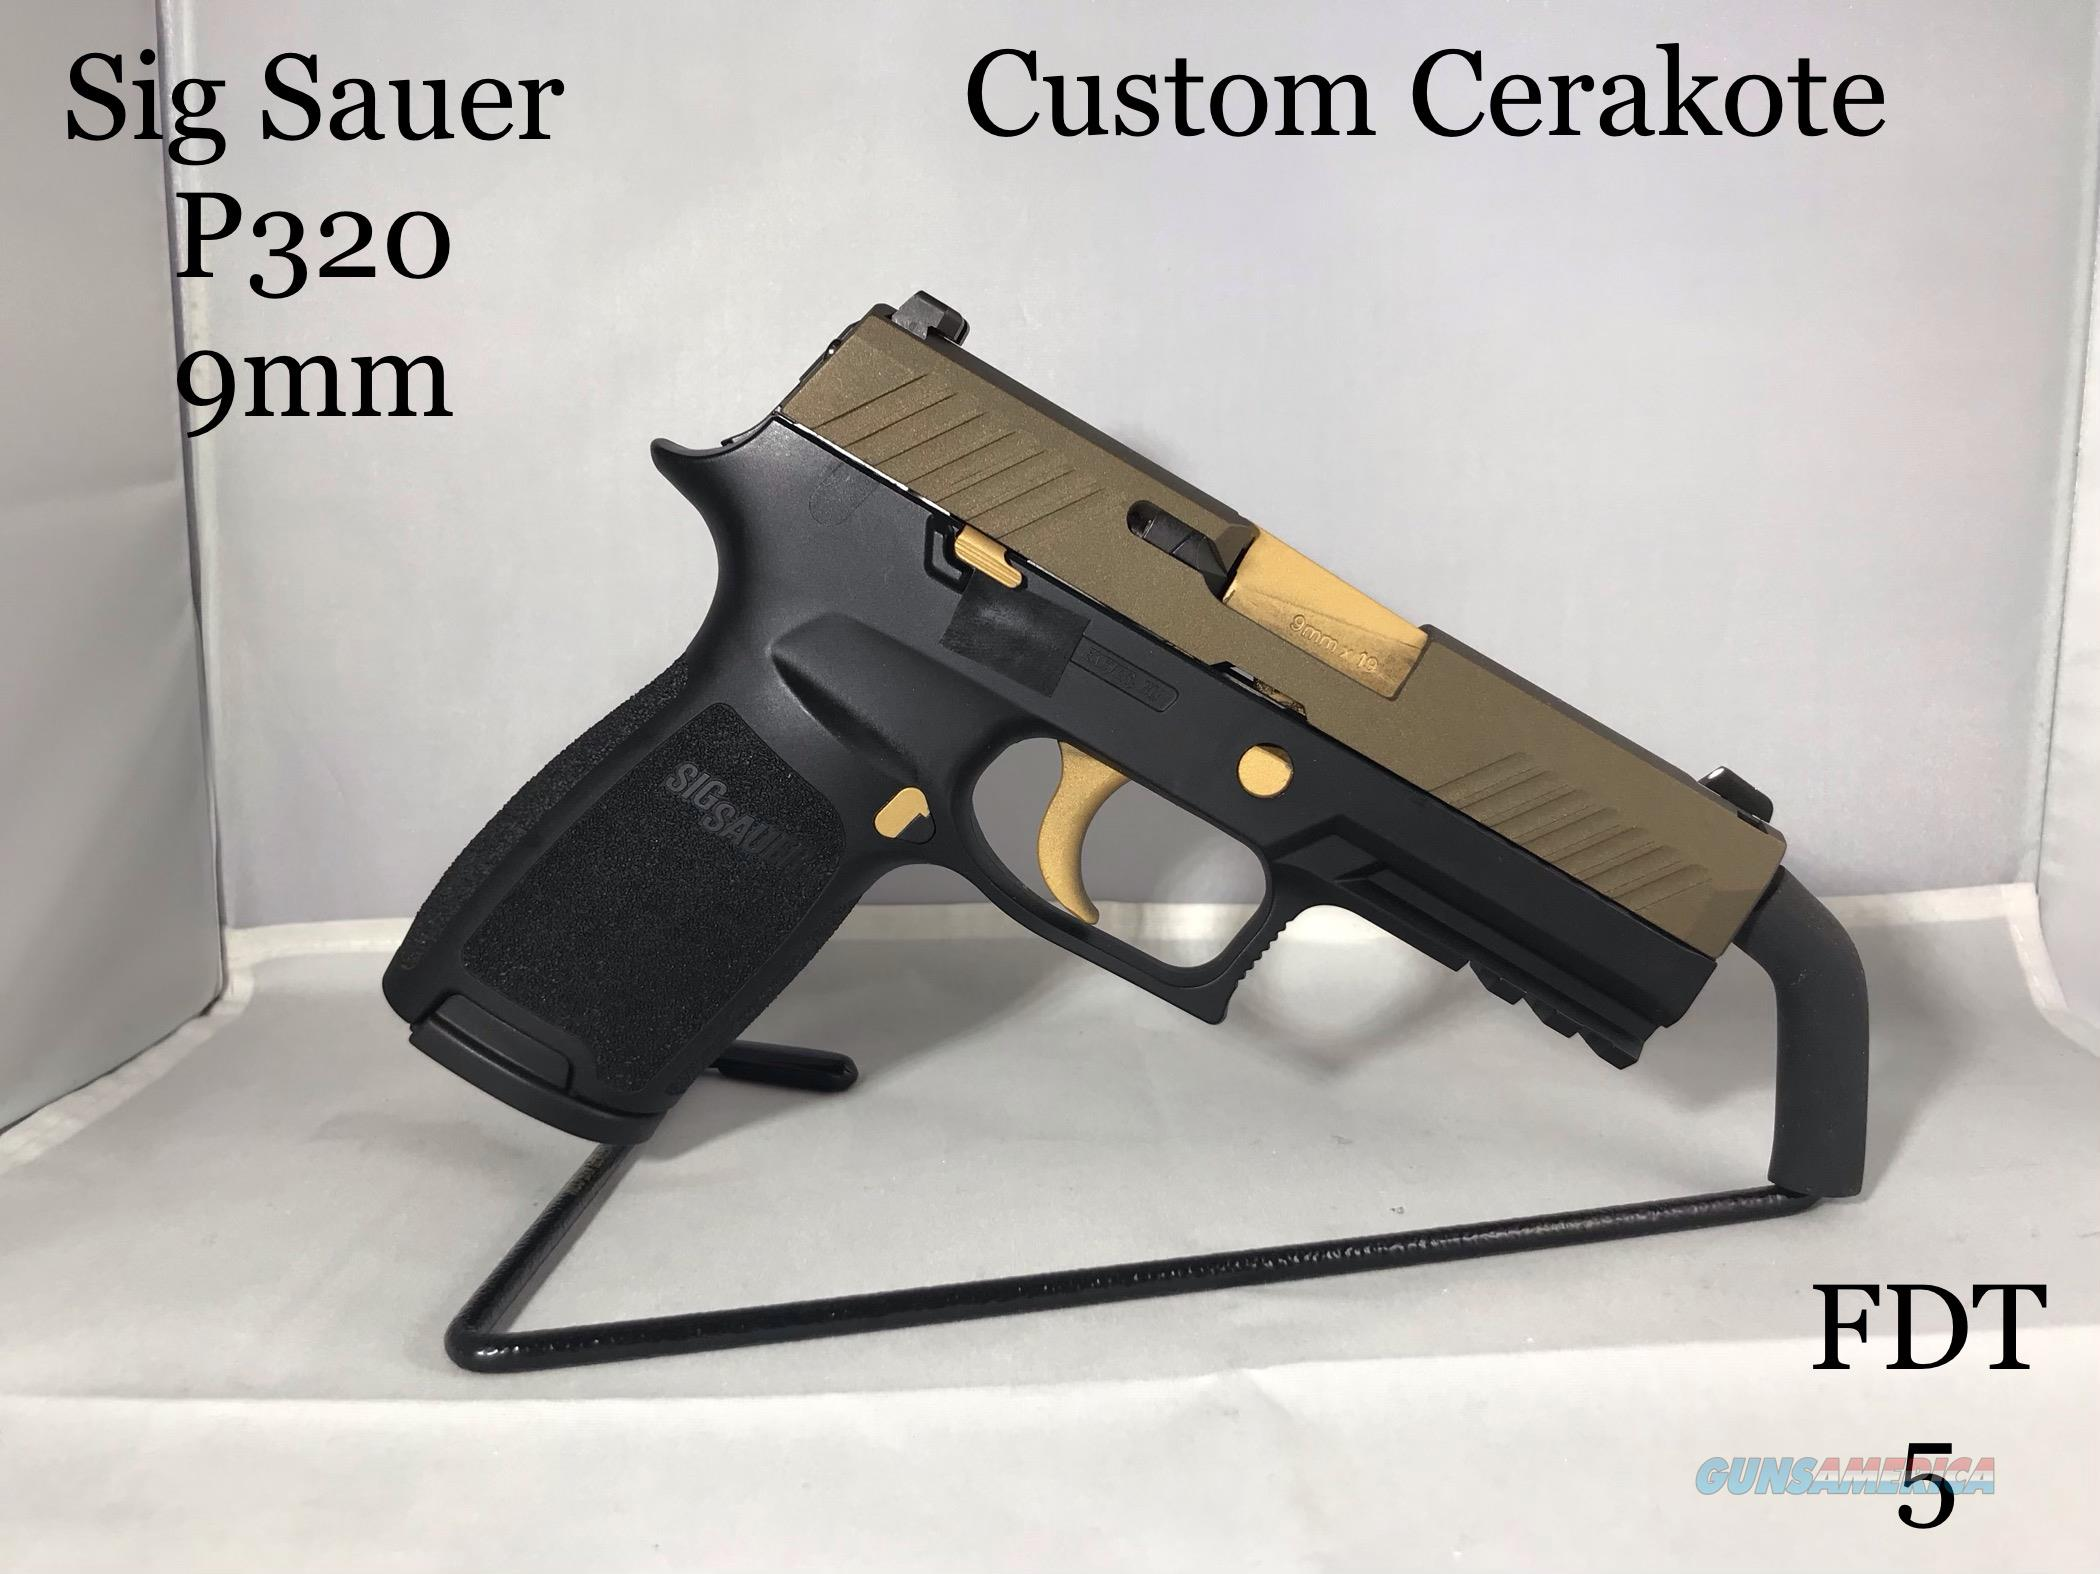 Sig Sauer P320 9mm, Custom Cerakote